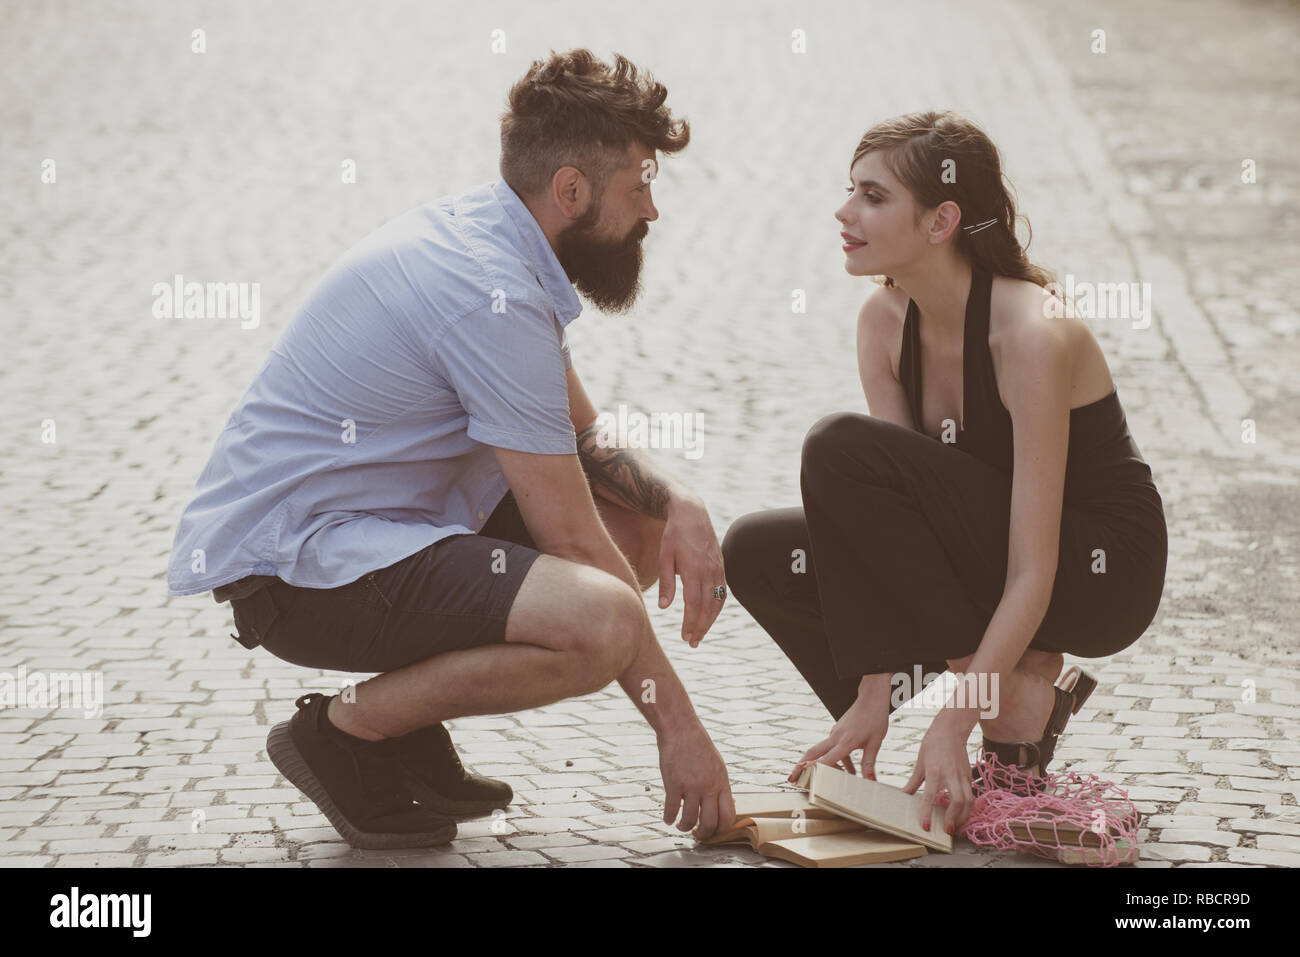 Romantisches Dating-Profil